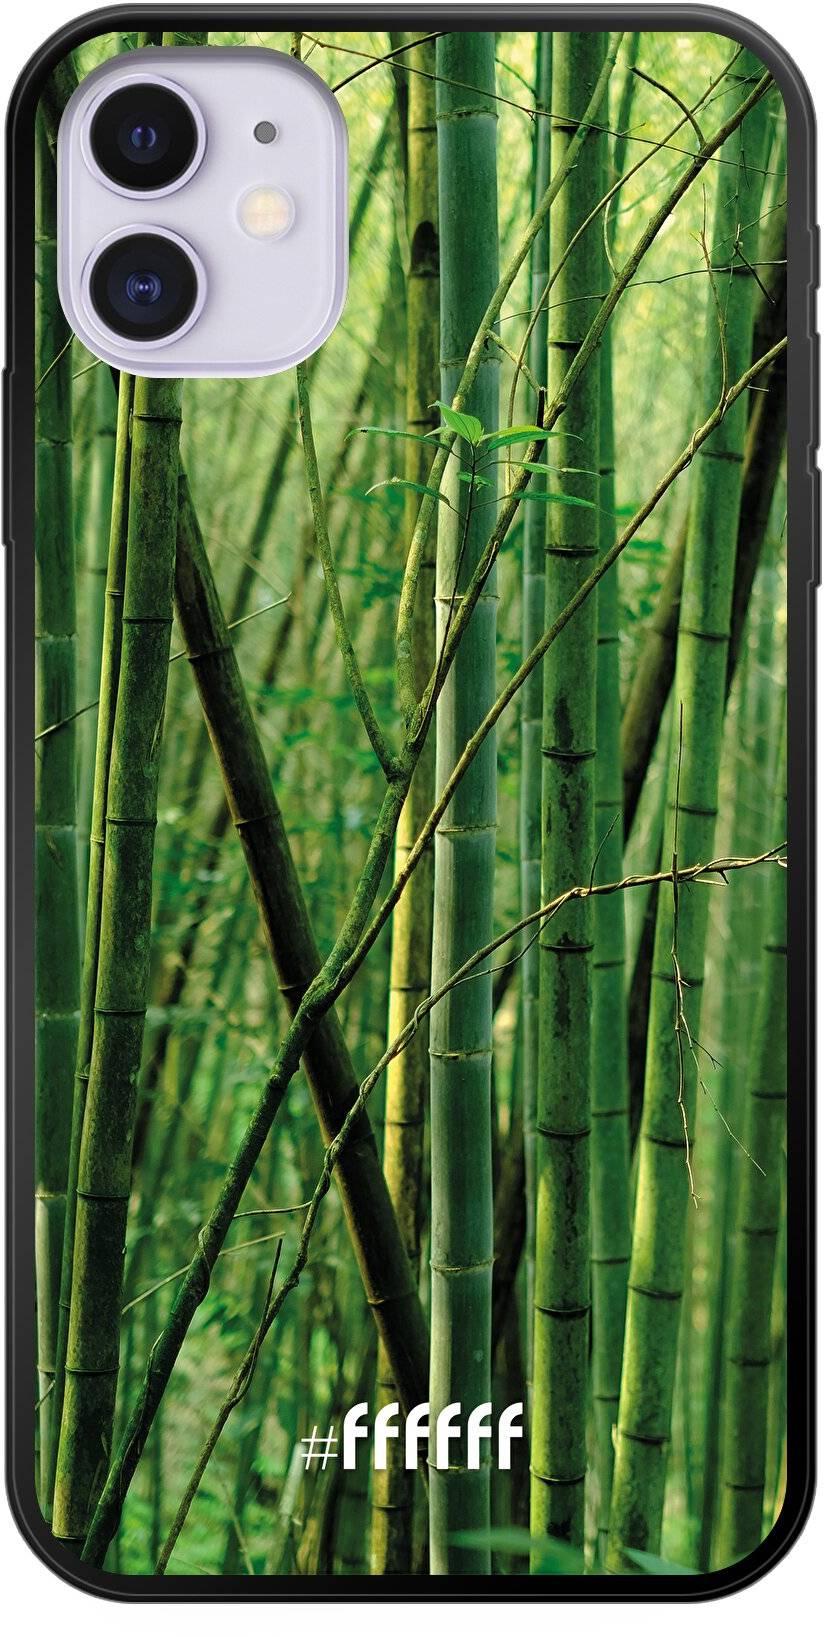 Bamboo iPhone 11